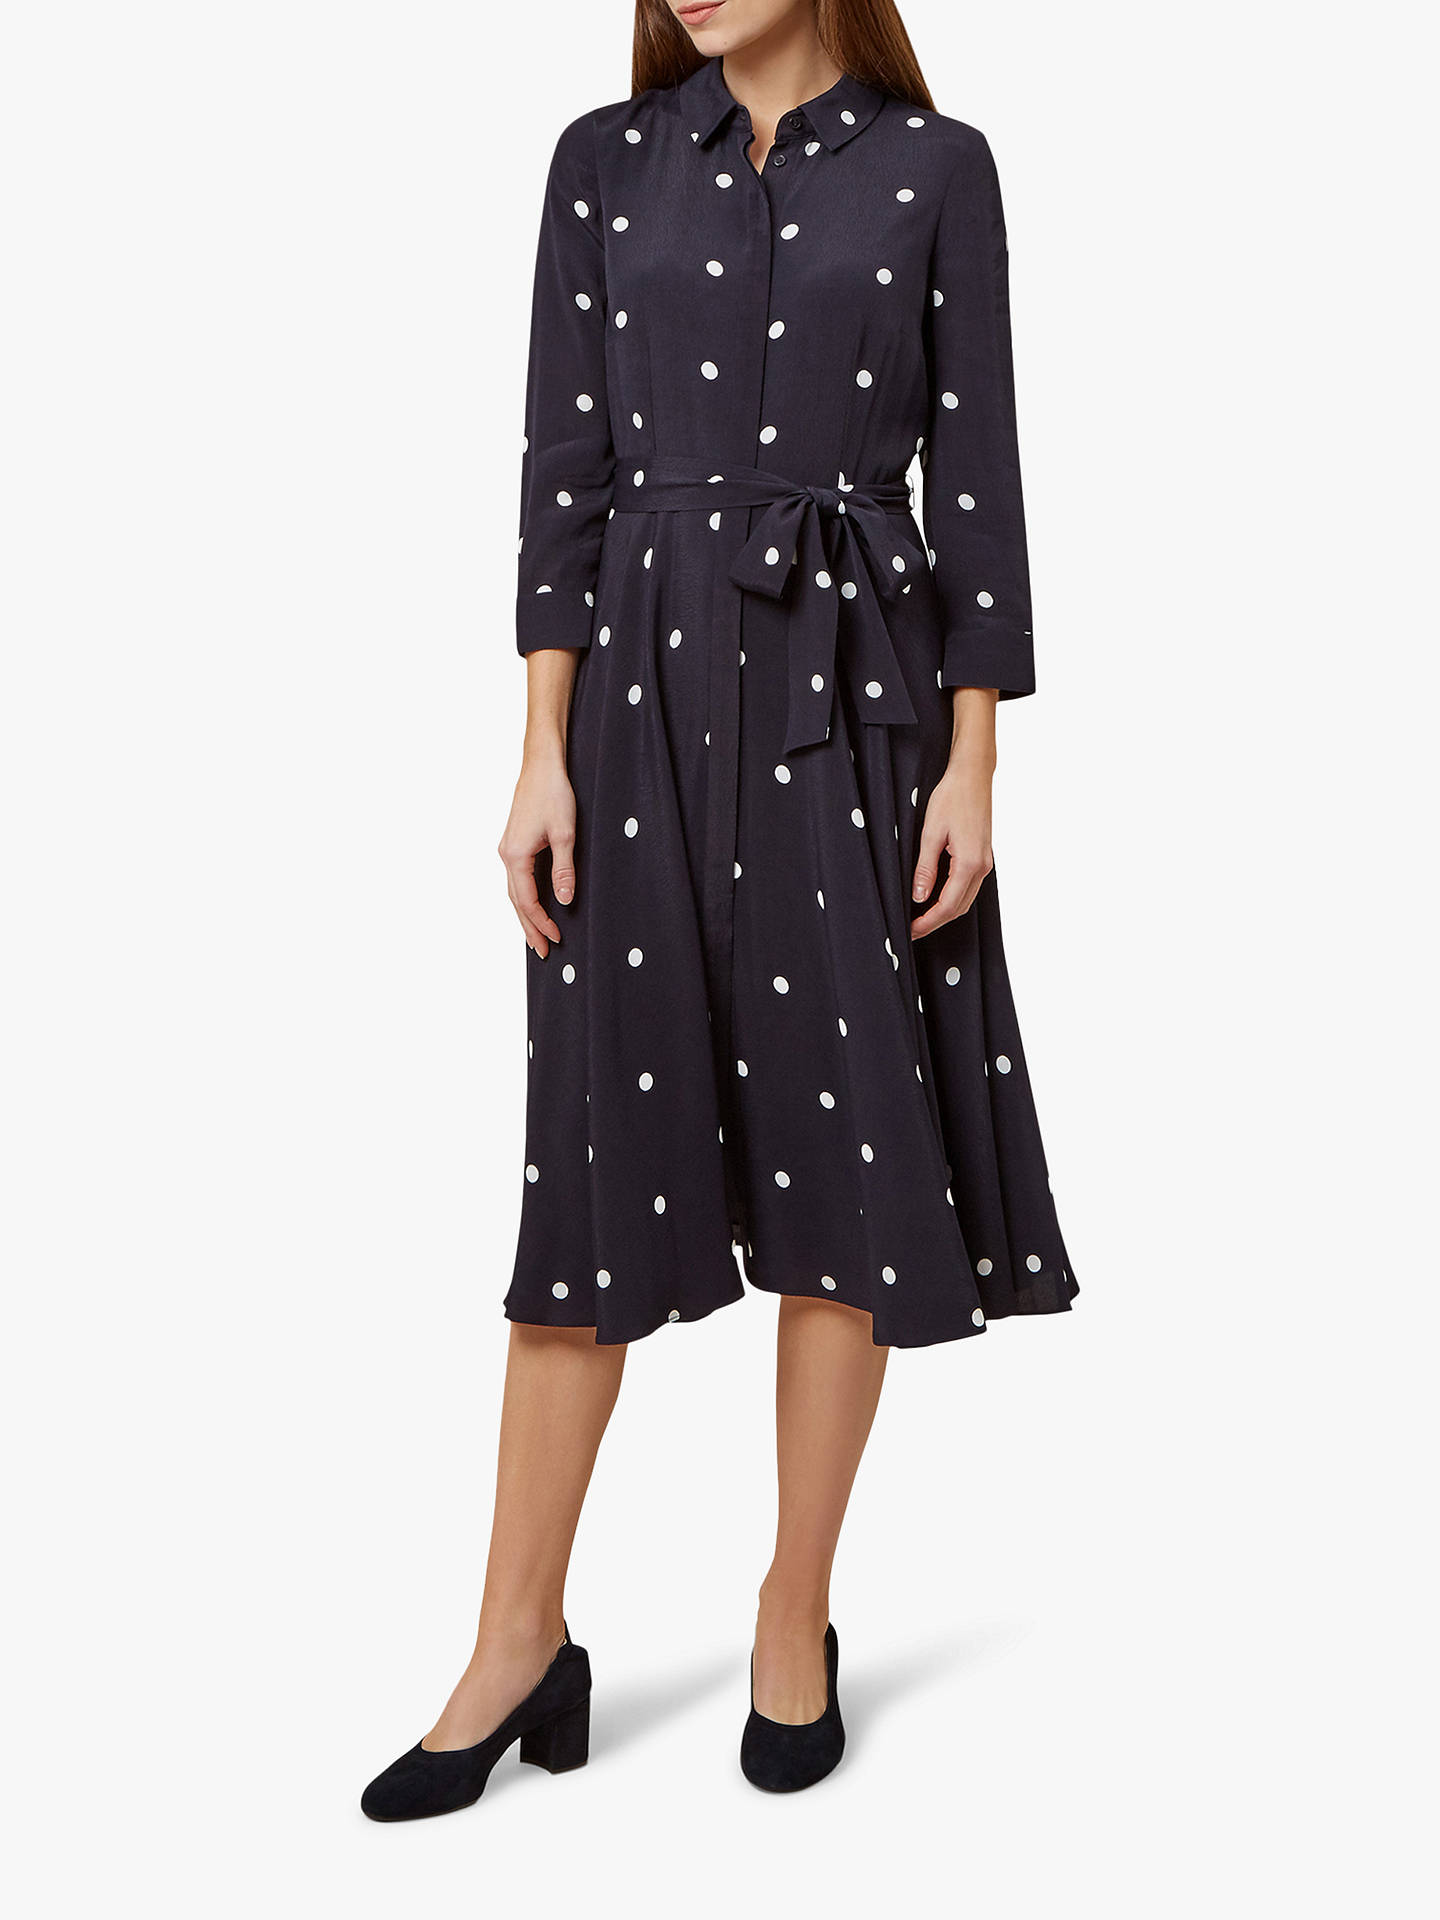 25a73913fd6c Buy Hobbs Lainey Shirt Dress